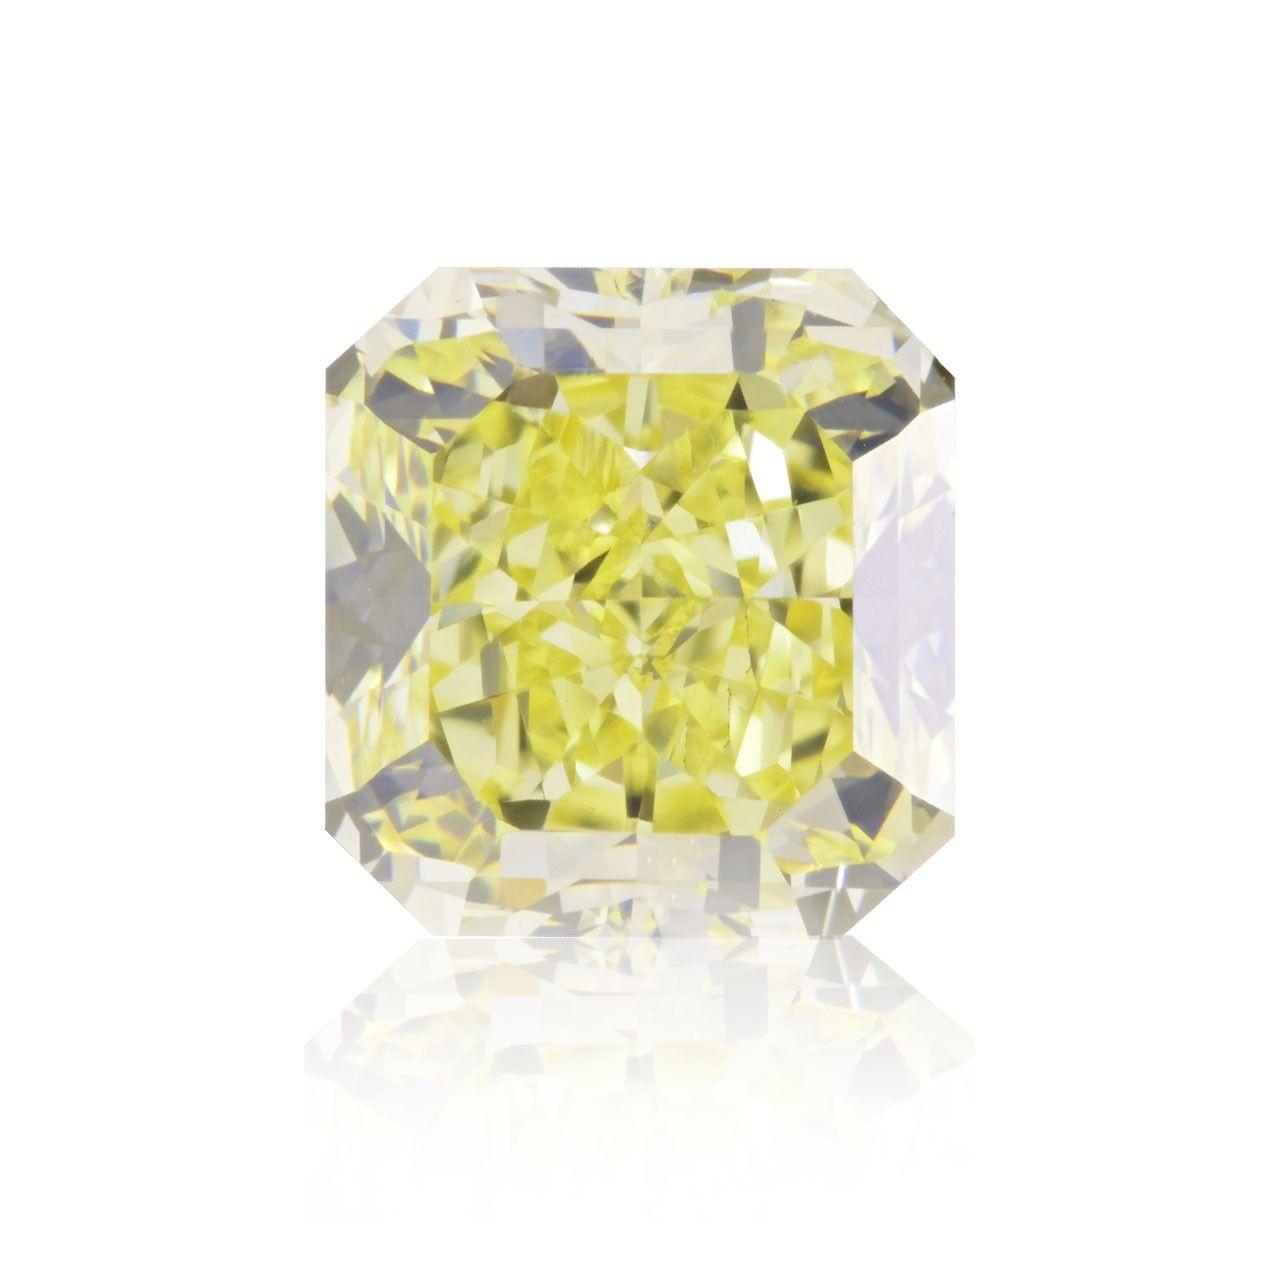 Yellow Diamond  - 2.01ct Natural Loose Fancy Light Yellow Canary Diamond GIA VS1